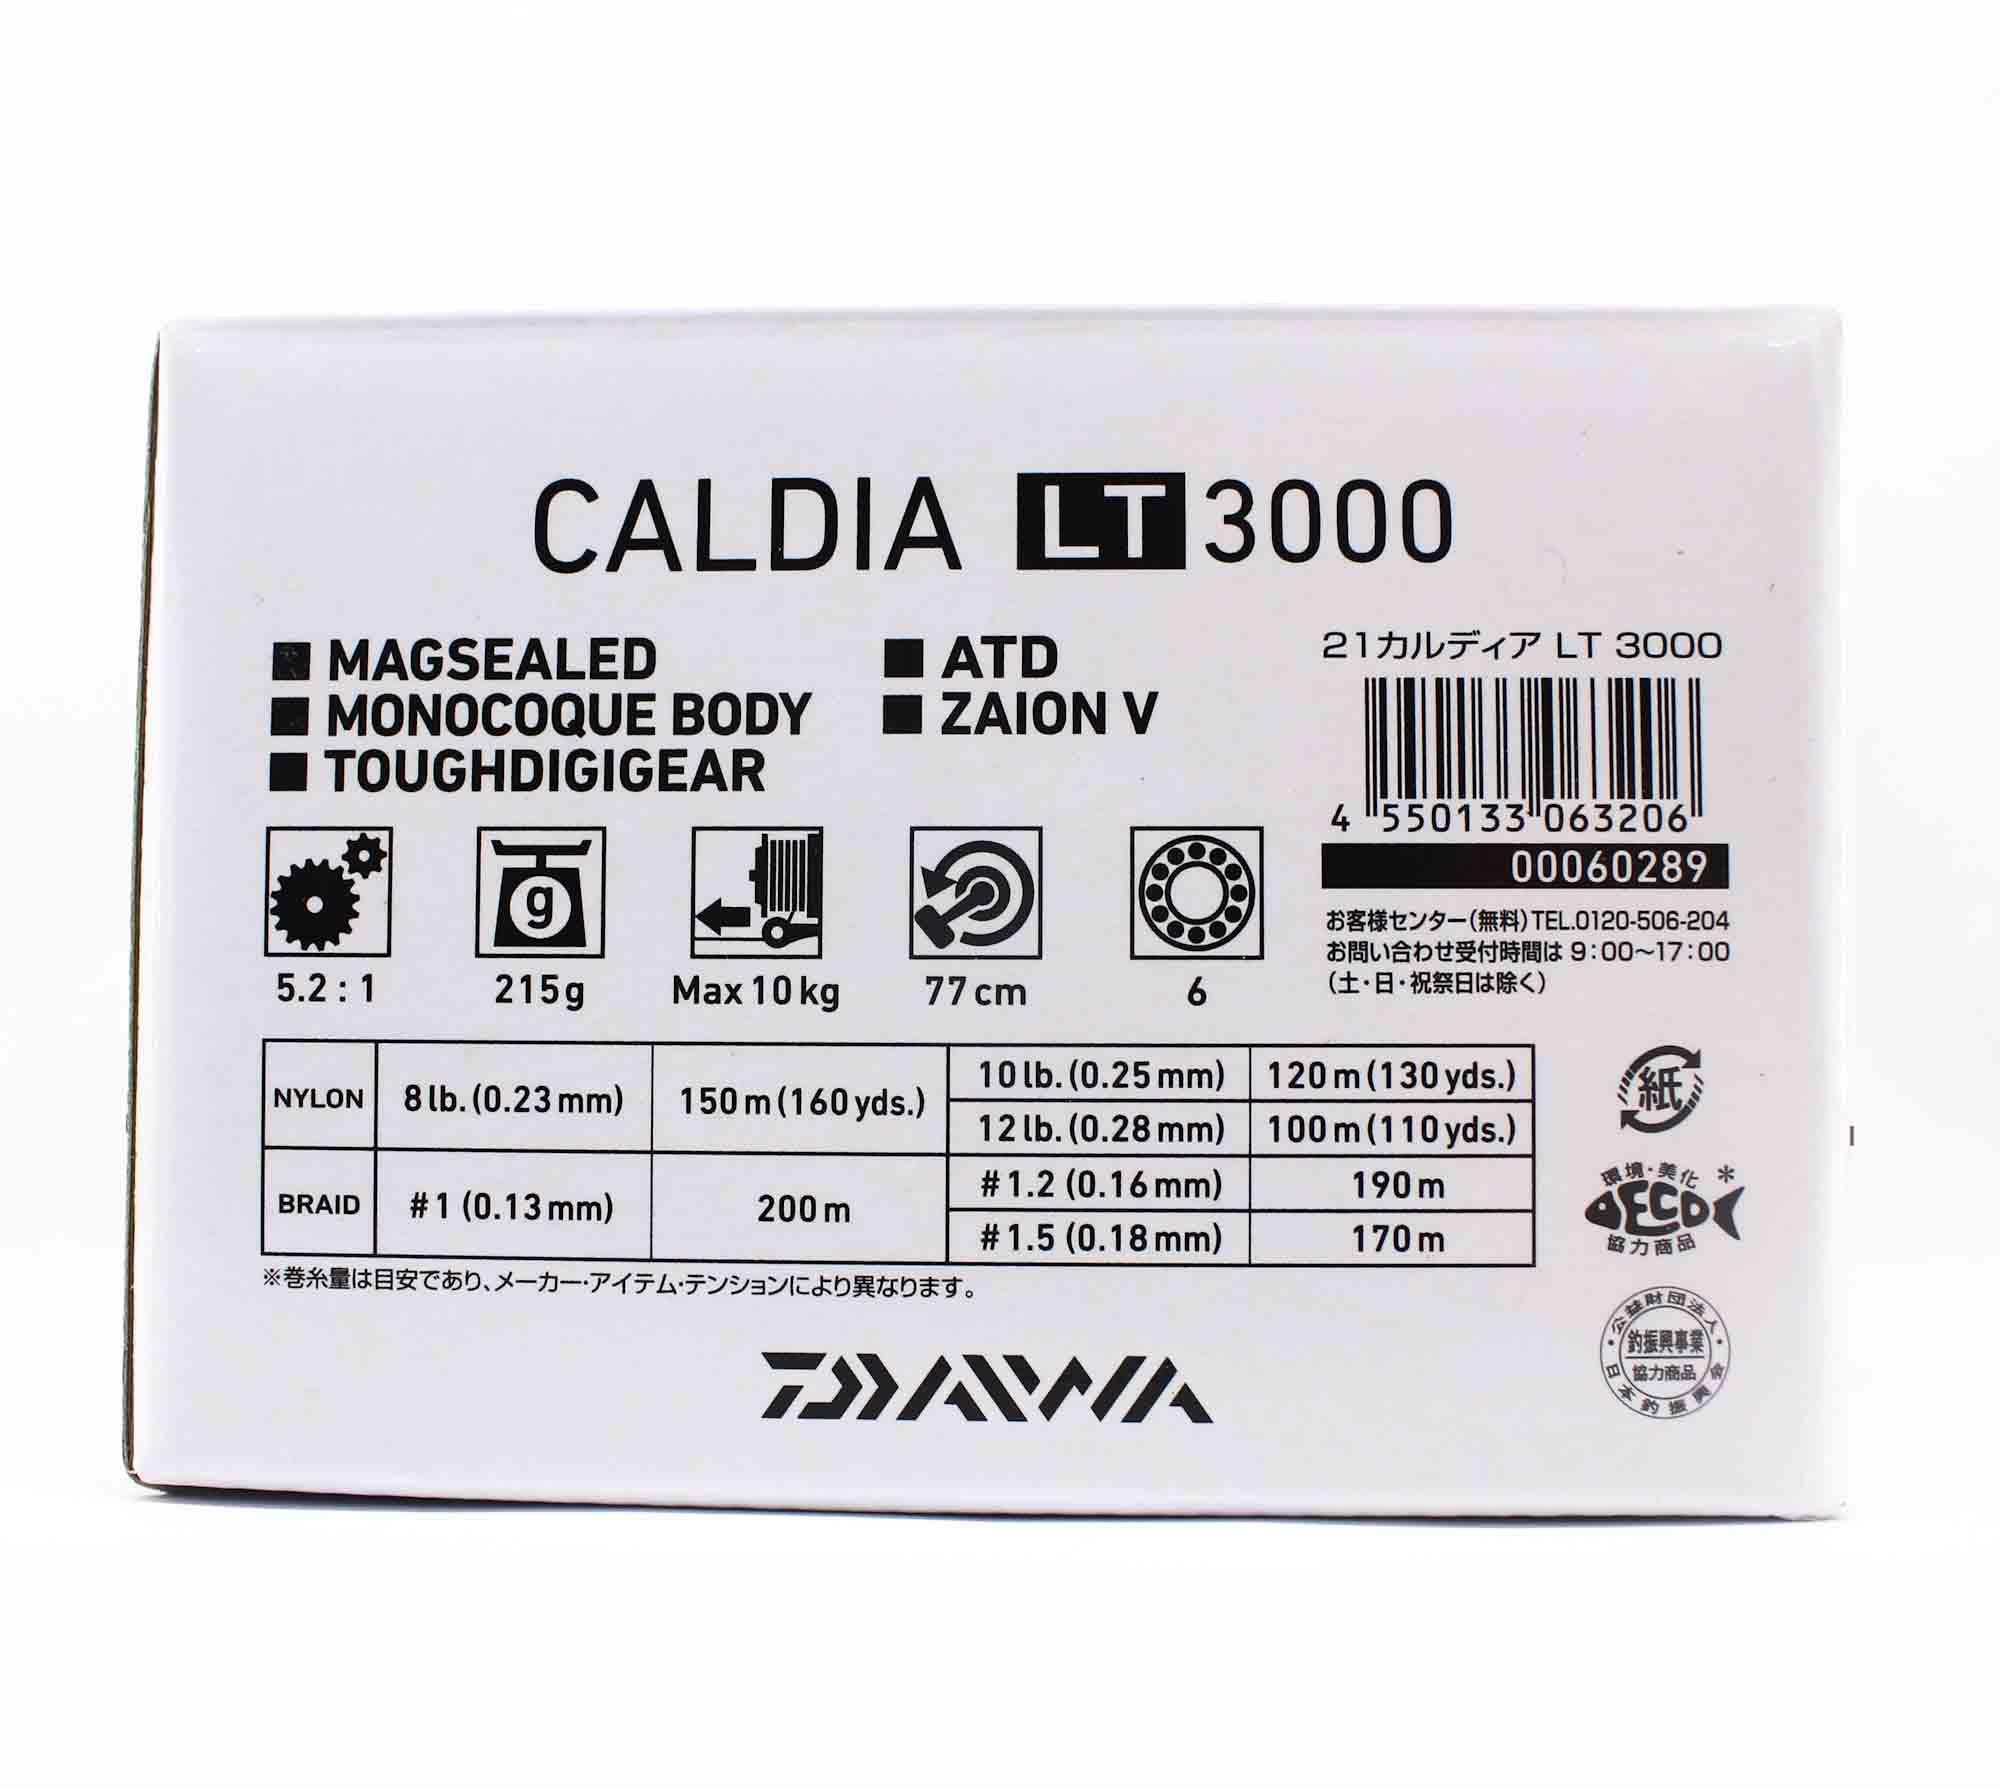 Daiwa Reel Spinning 21 Caldia LT3000 (3206)